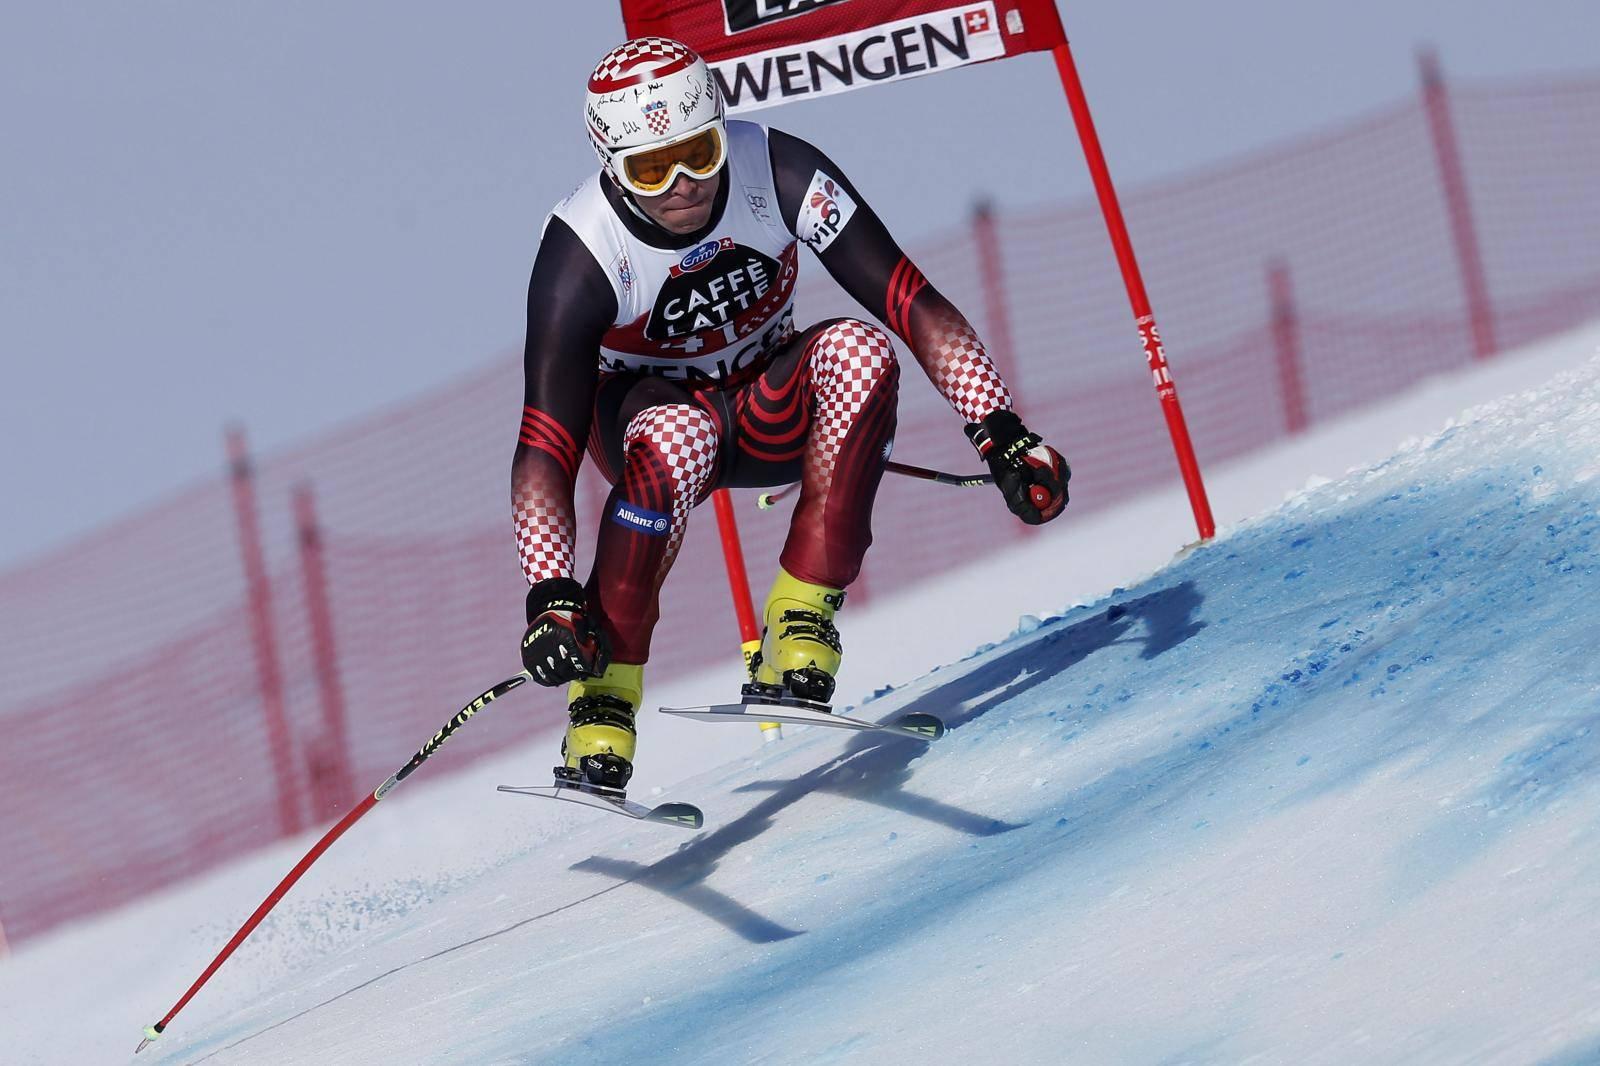 SUI, FIS Weltcup Ski Alpin, Wengen